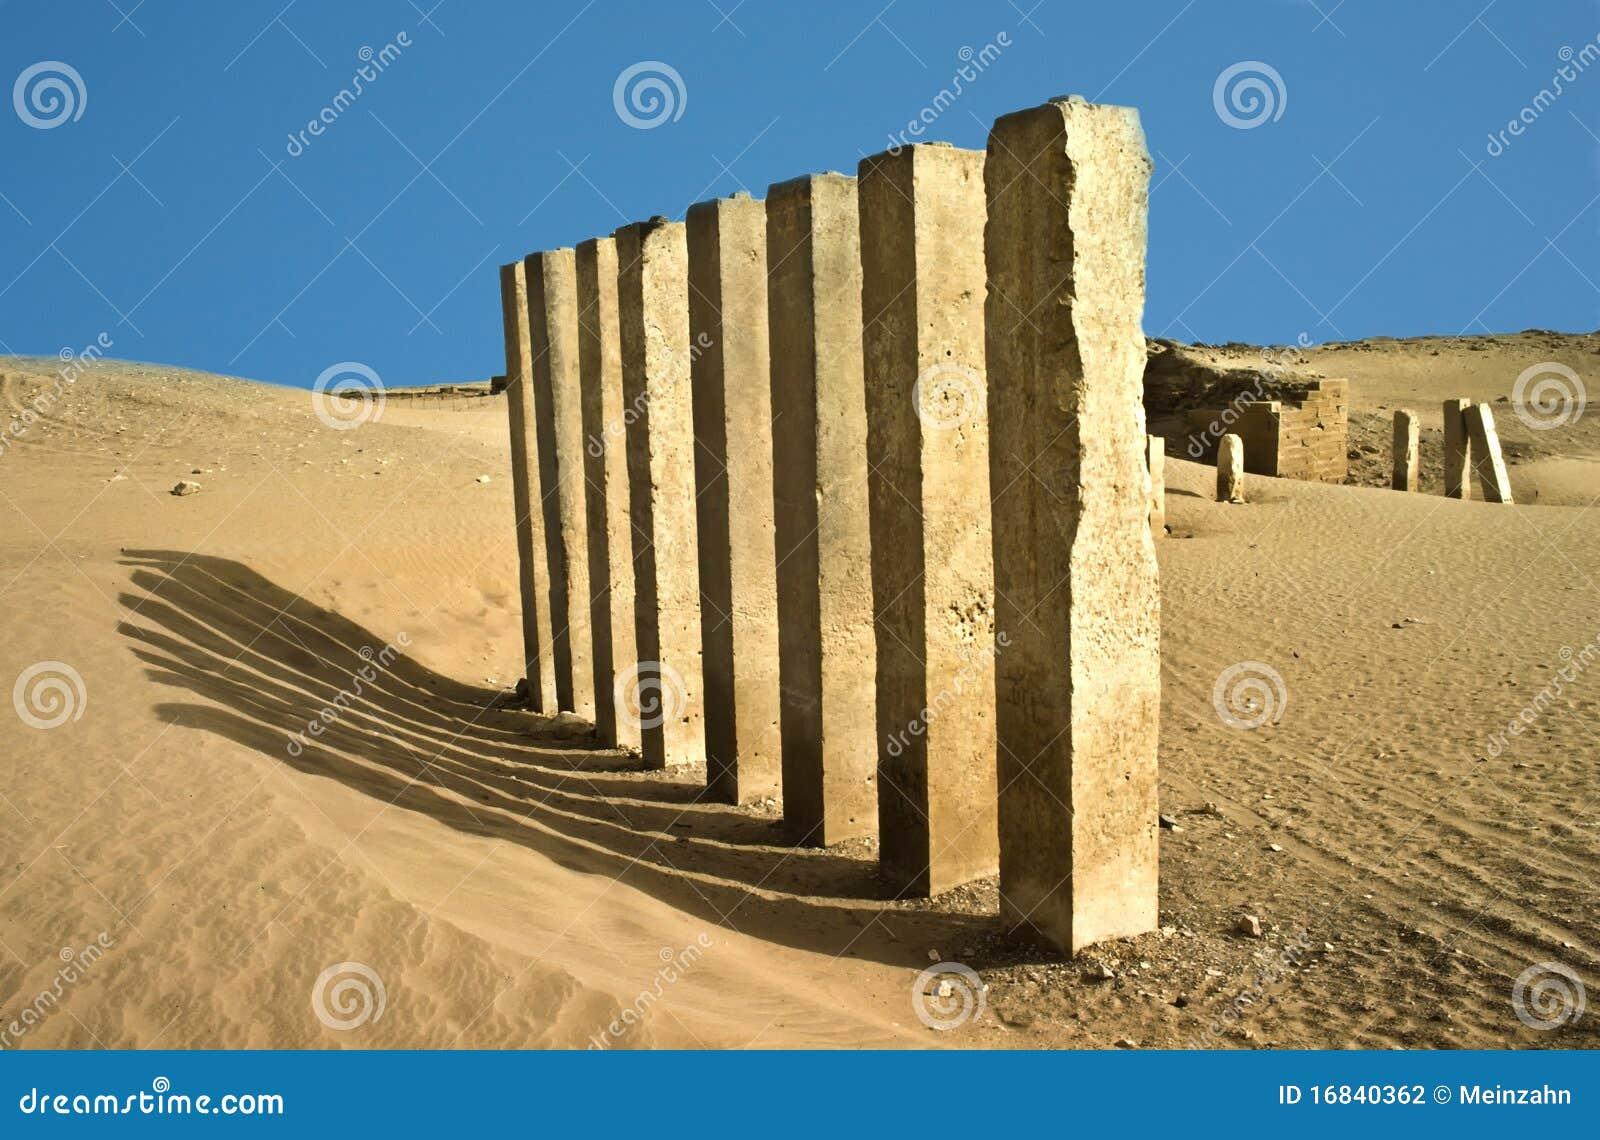 Desert Rock Pillars : Pillars of moon temple in desert stock photo image